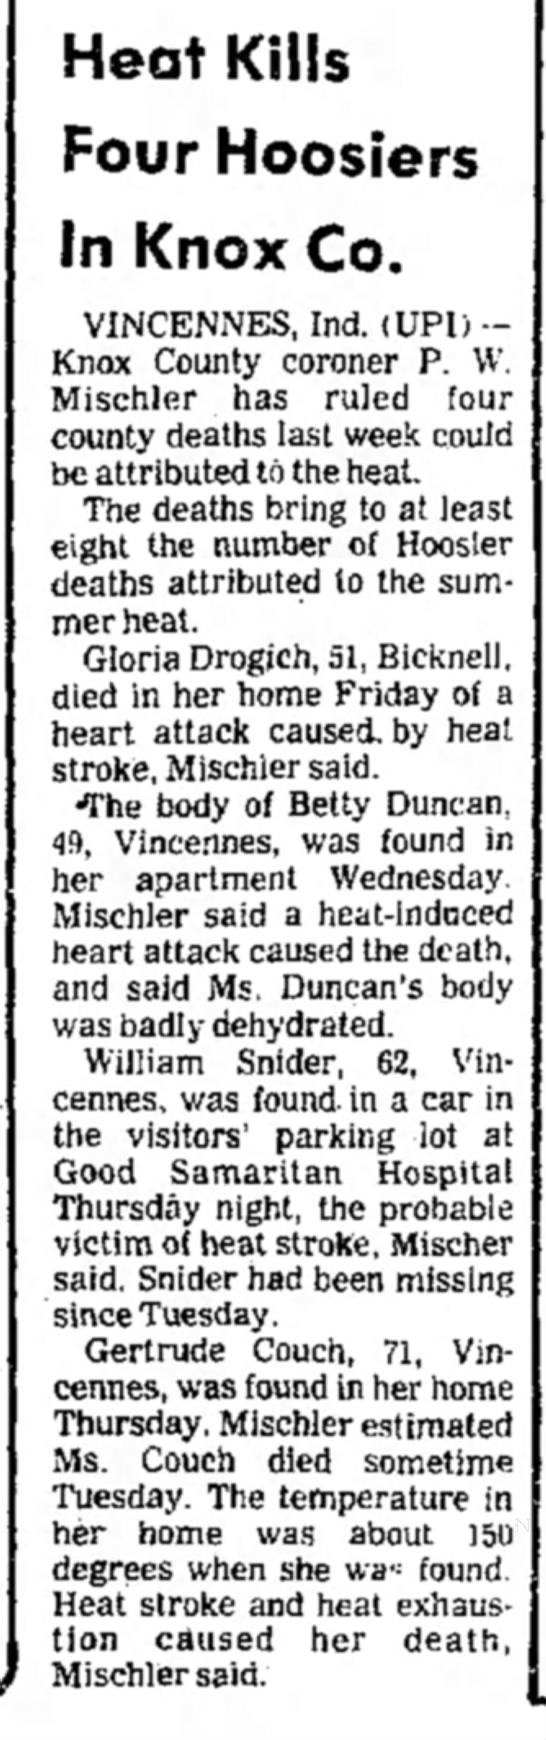 Heat Kills Four In Knox County July 20, 1980 Logansport Pharos-Tribune pg 13 - Heat Kills Four Hoosiers In Knox Co. VINCENNES,...